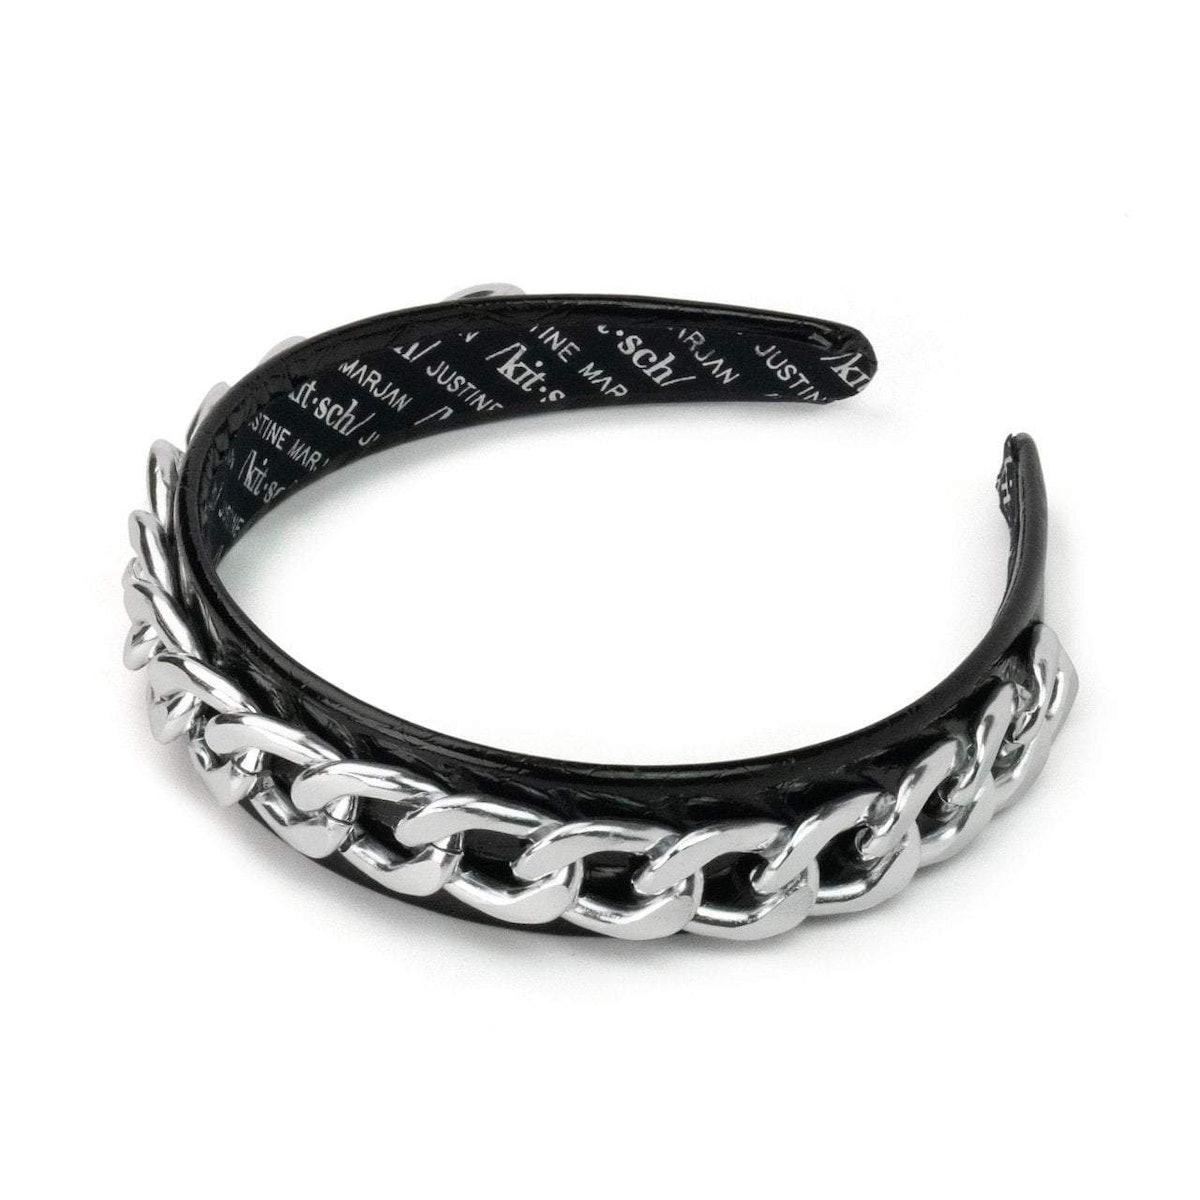 Patent Headband With Chain